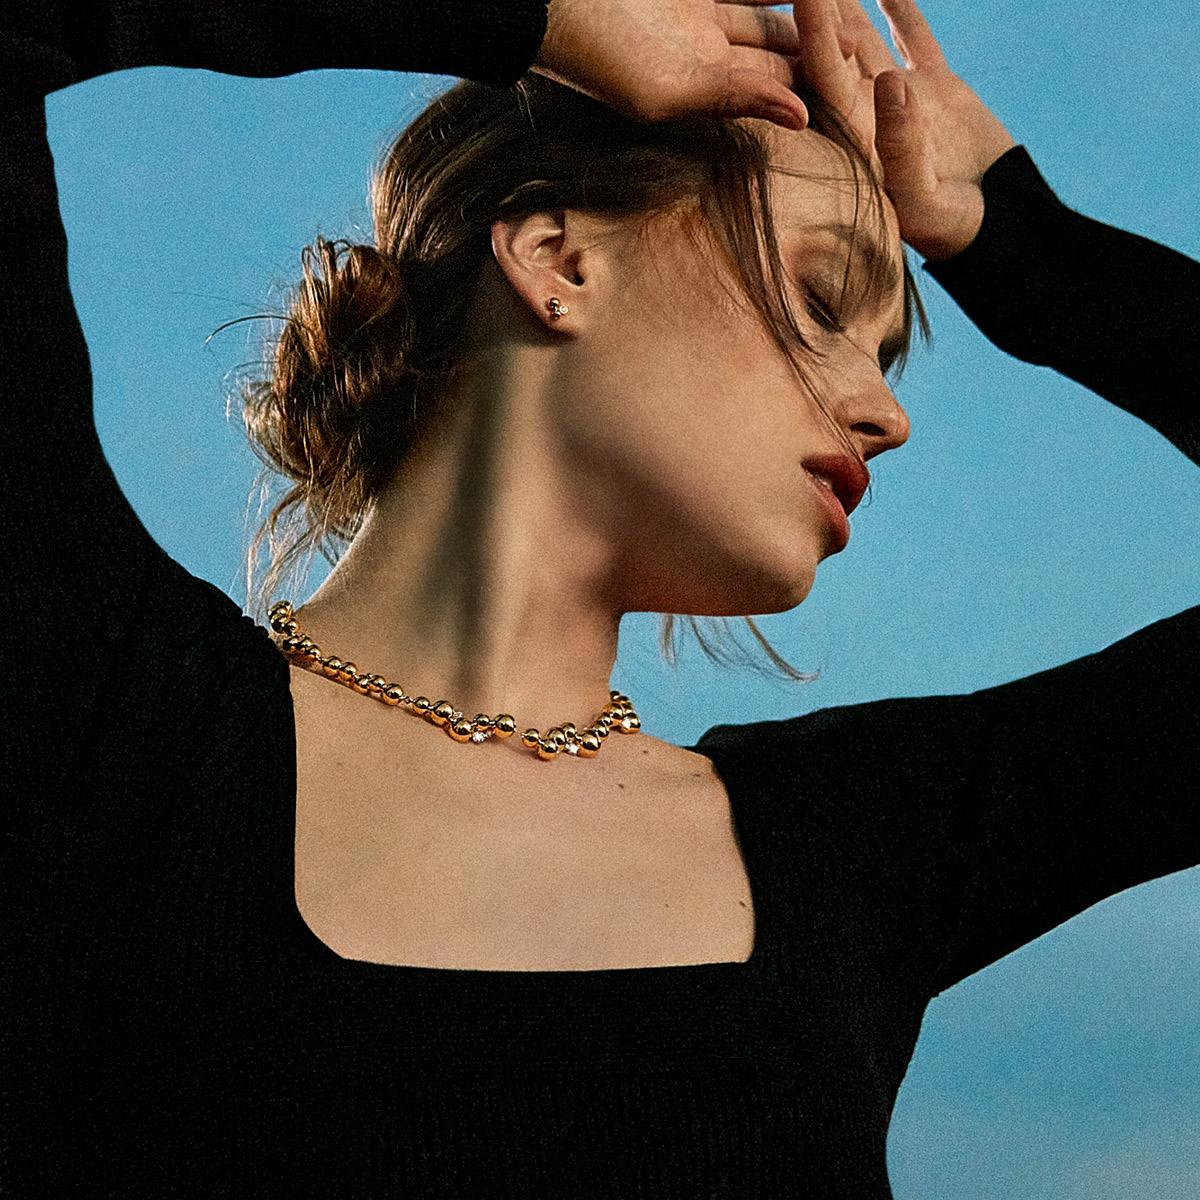 MOONLIGHT GRAPES Halskette mit Anhänger